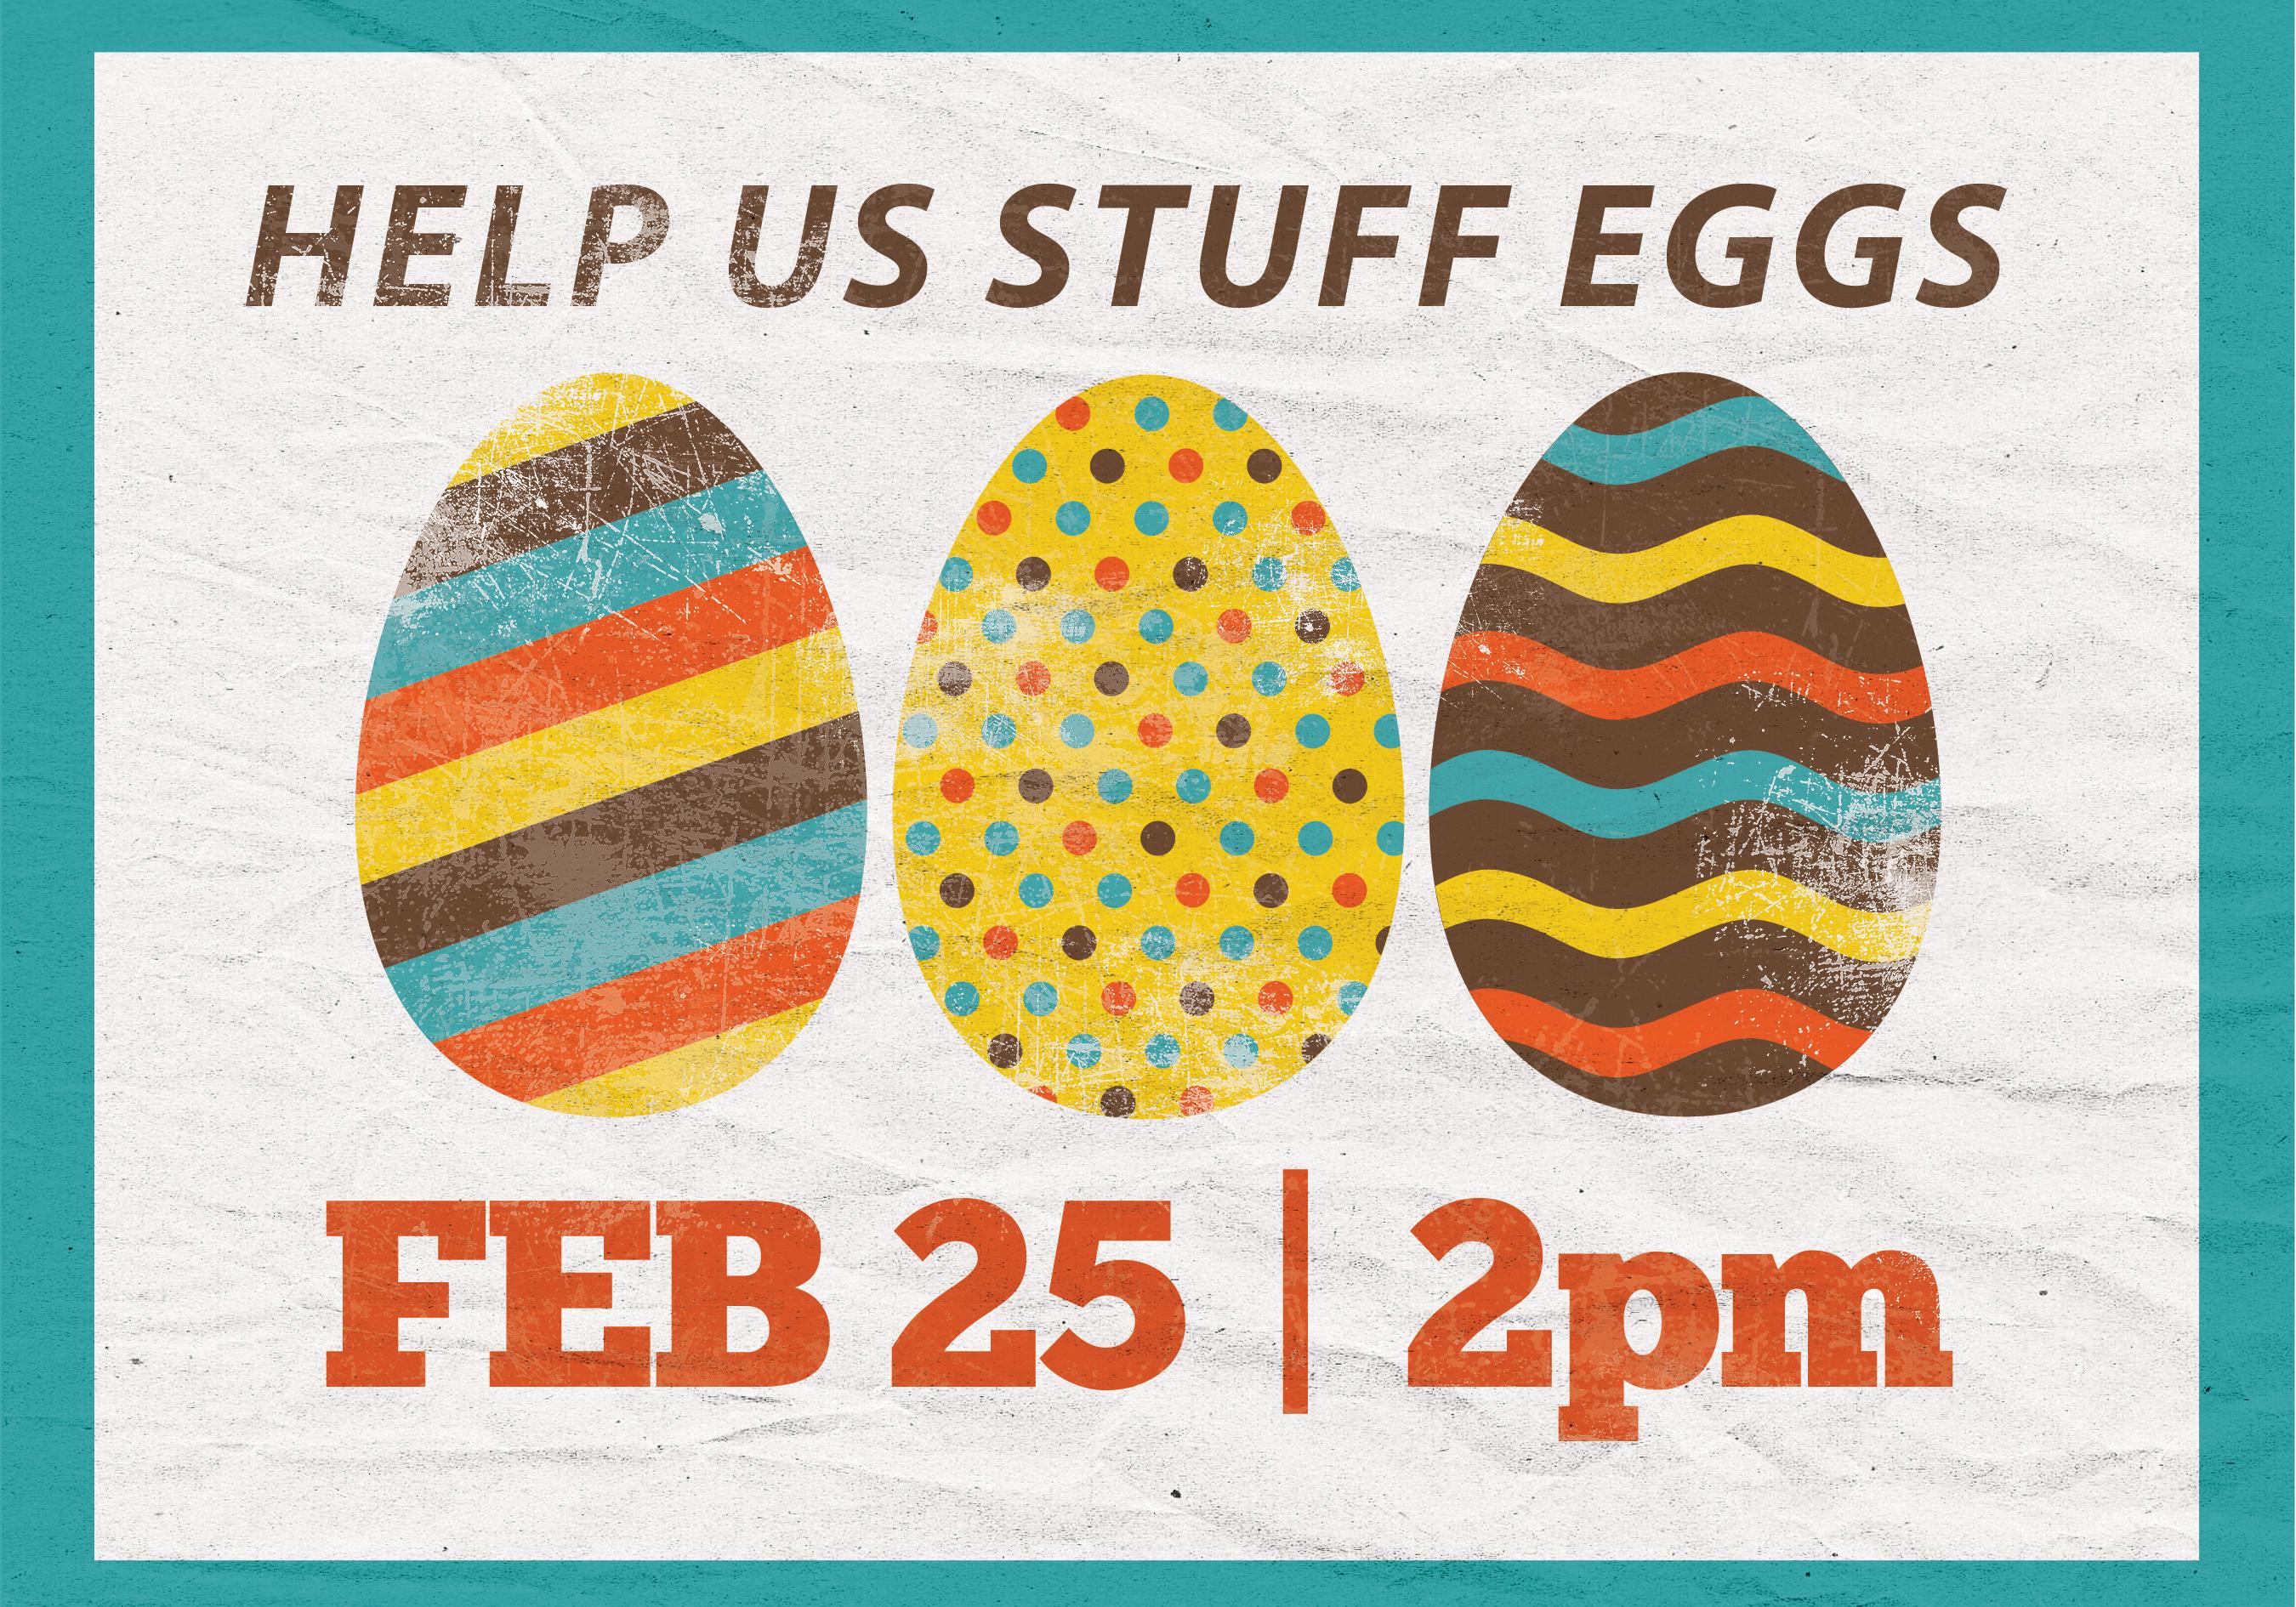 Egg stuffing 2018 rgb